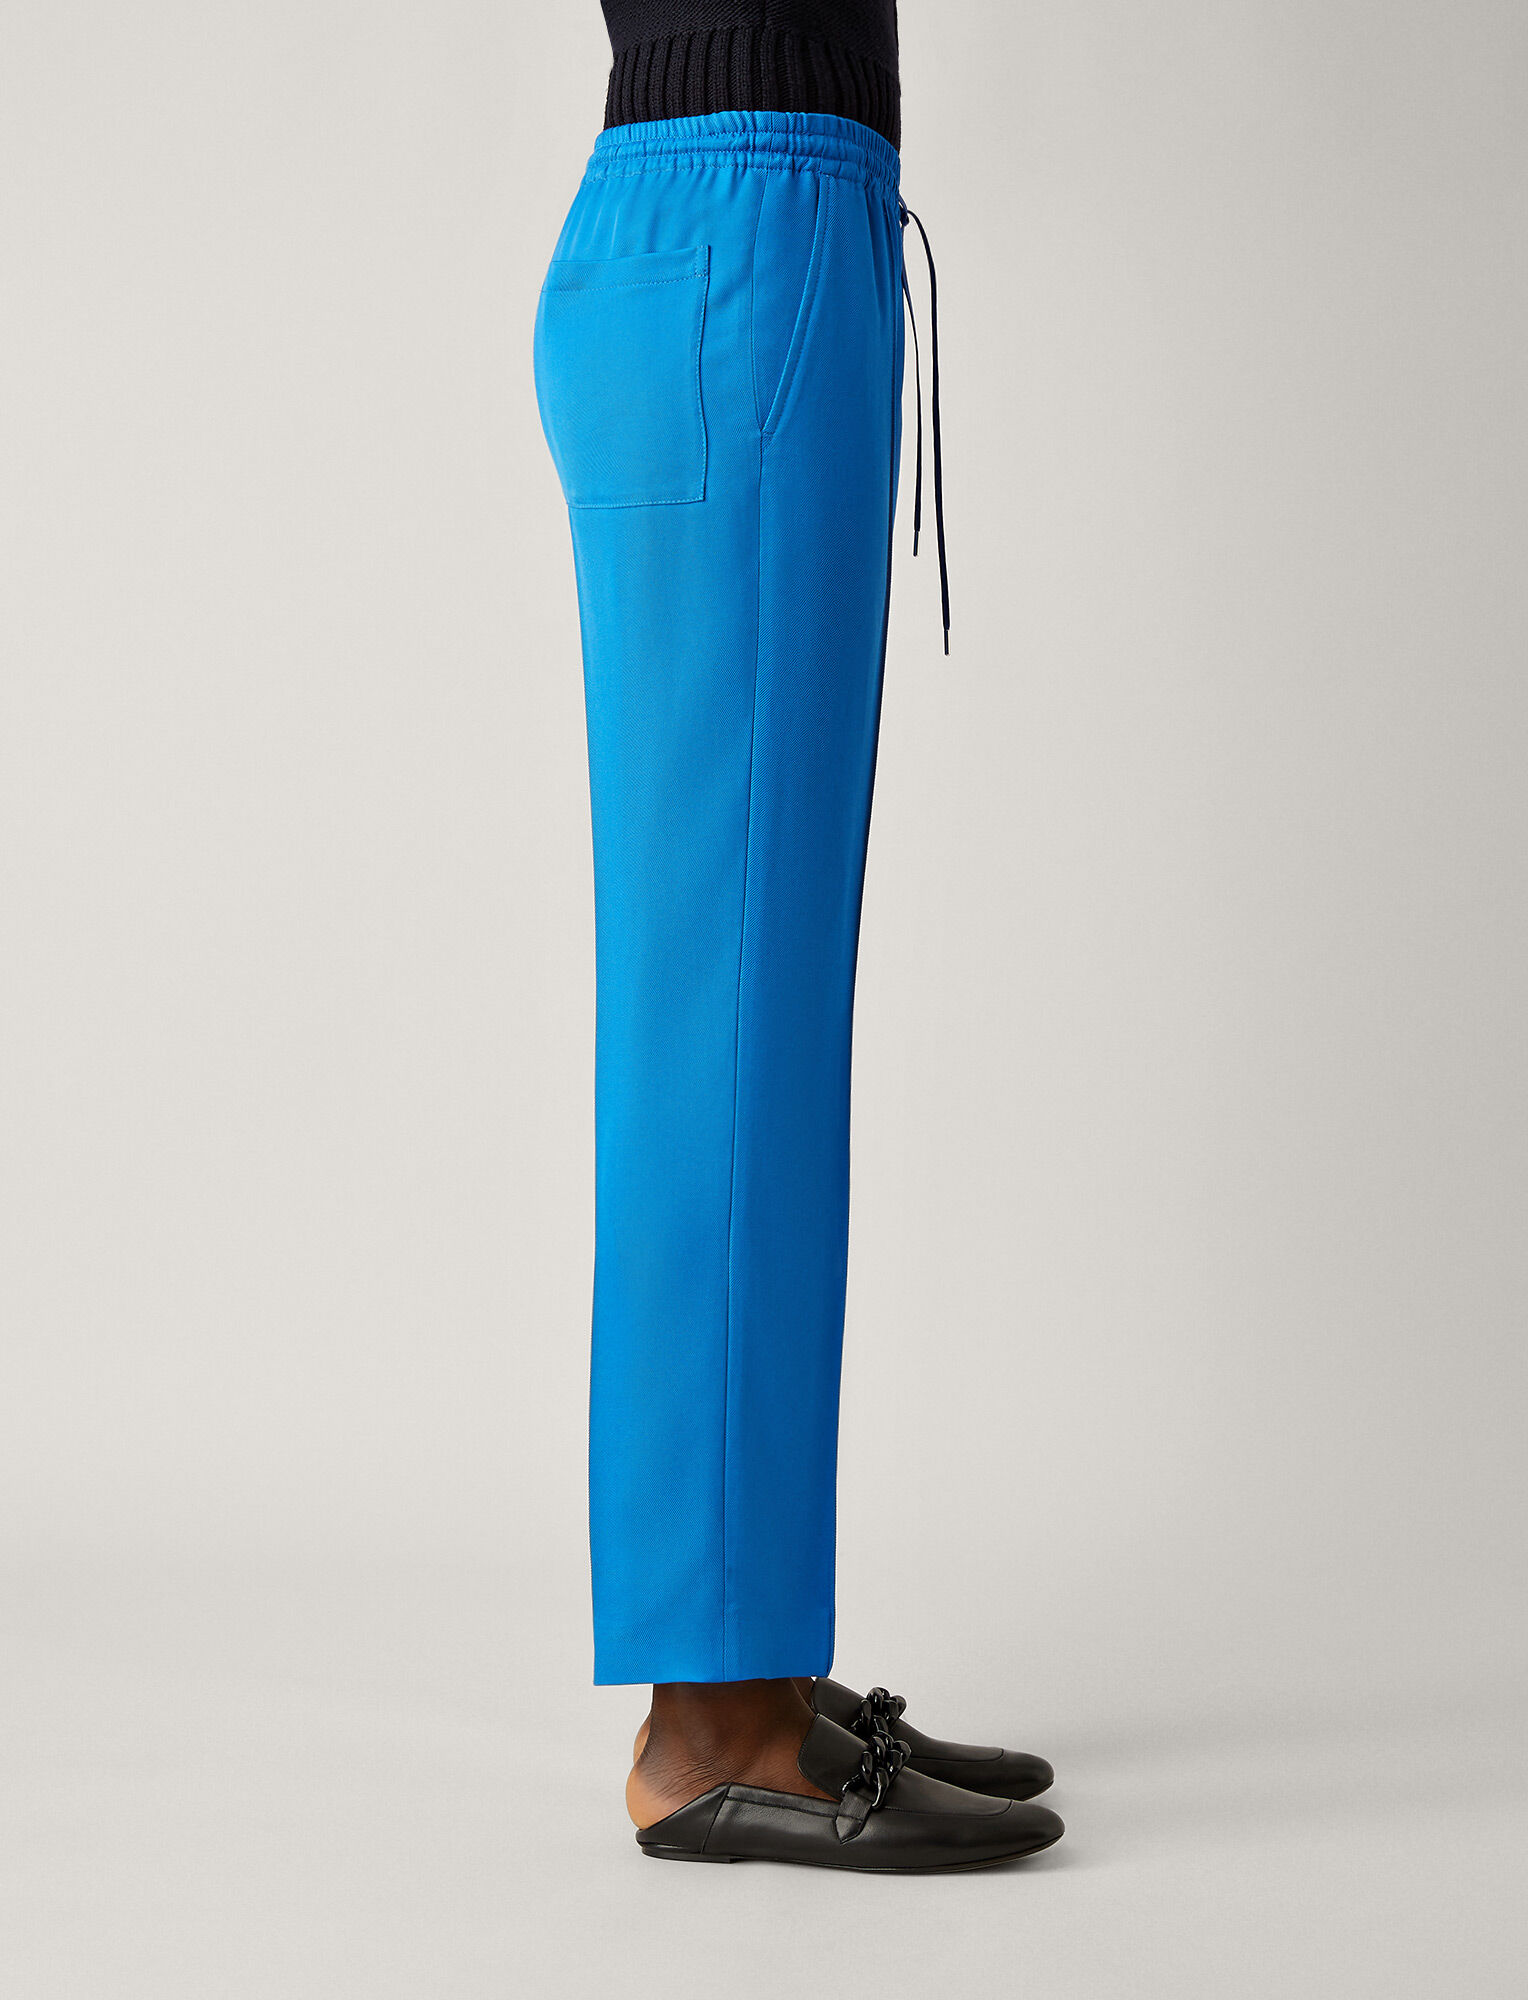 Joseph, Dino Liquid Twill Trousers, in PLASTIC BLUE